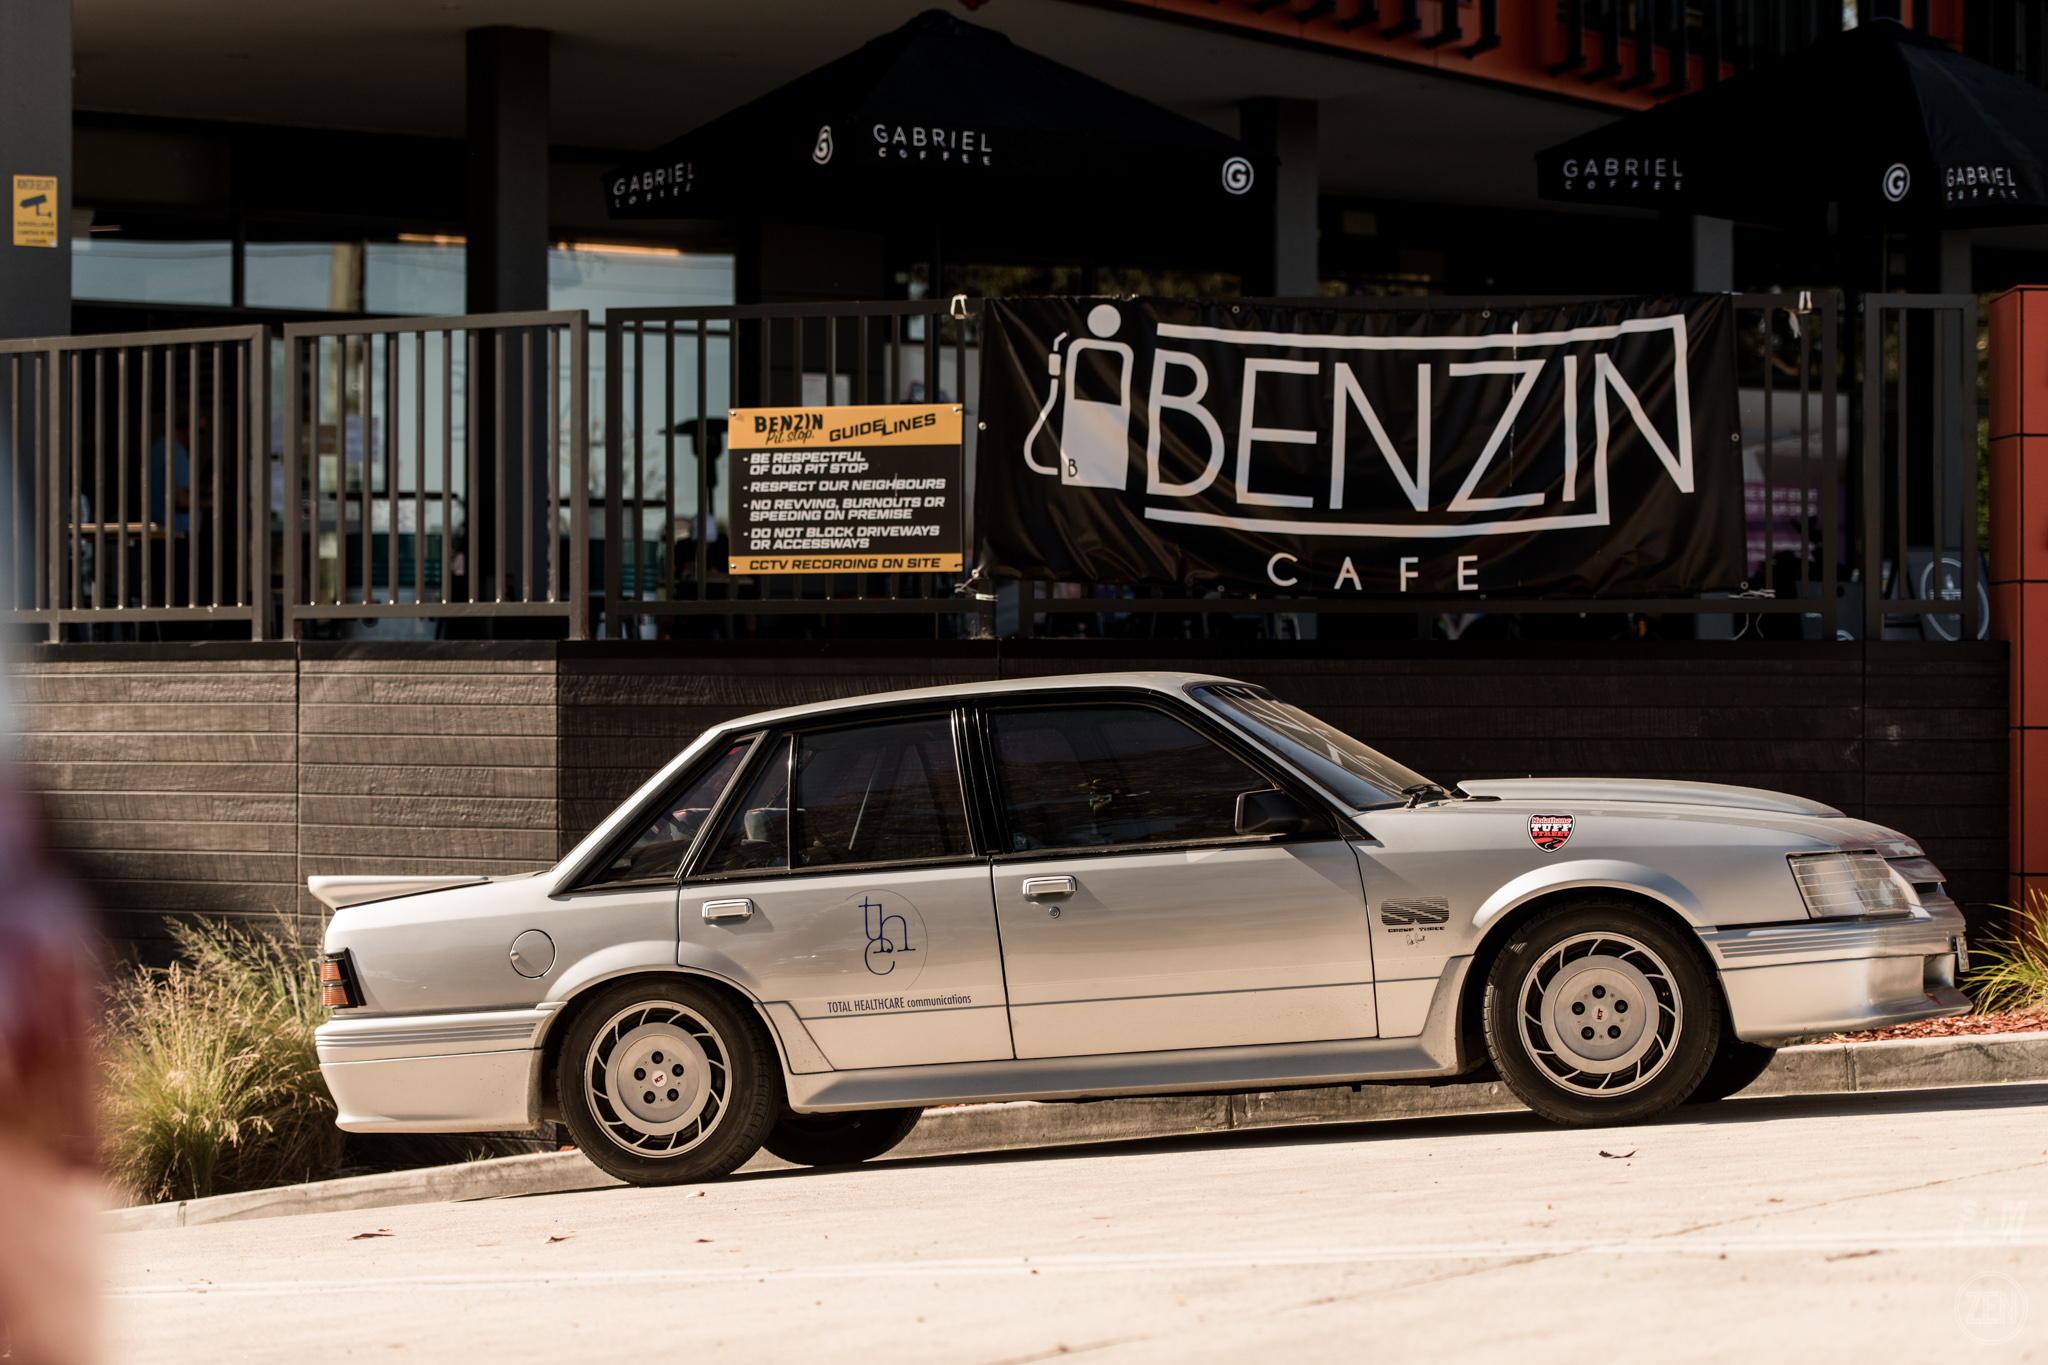 2020-11-15 - Benzin Sunday 013